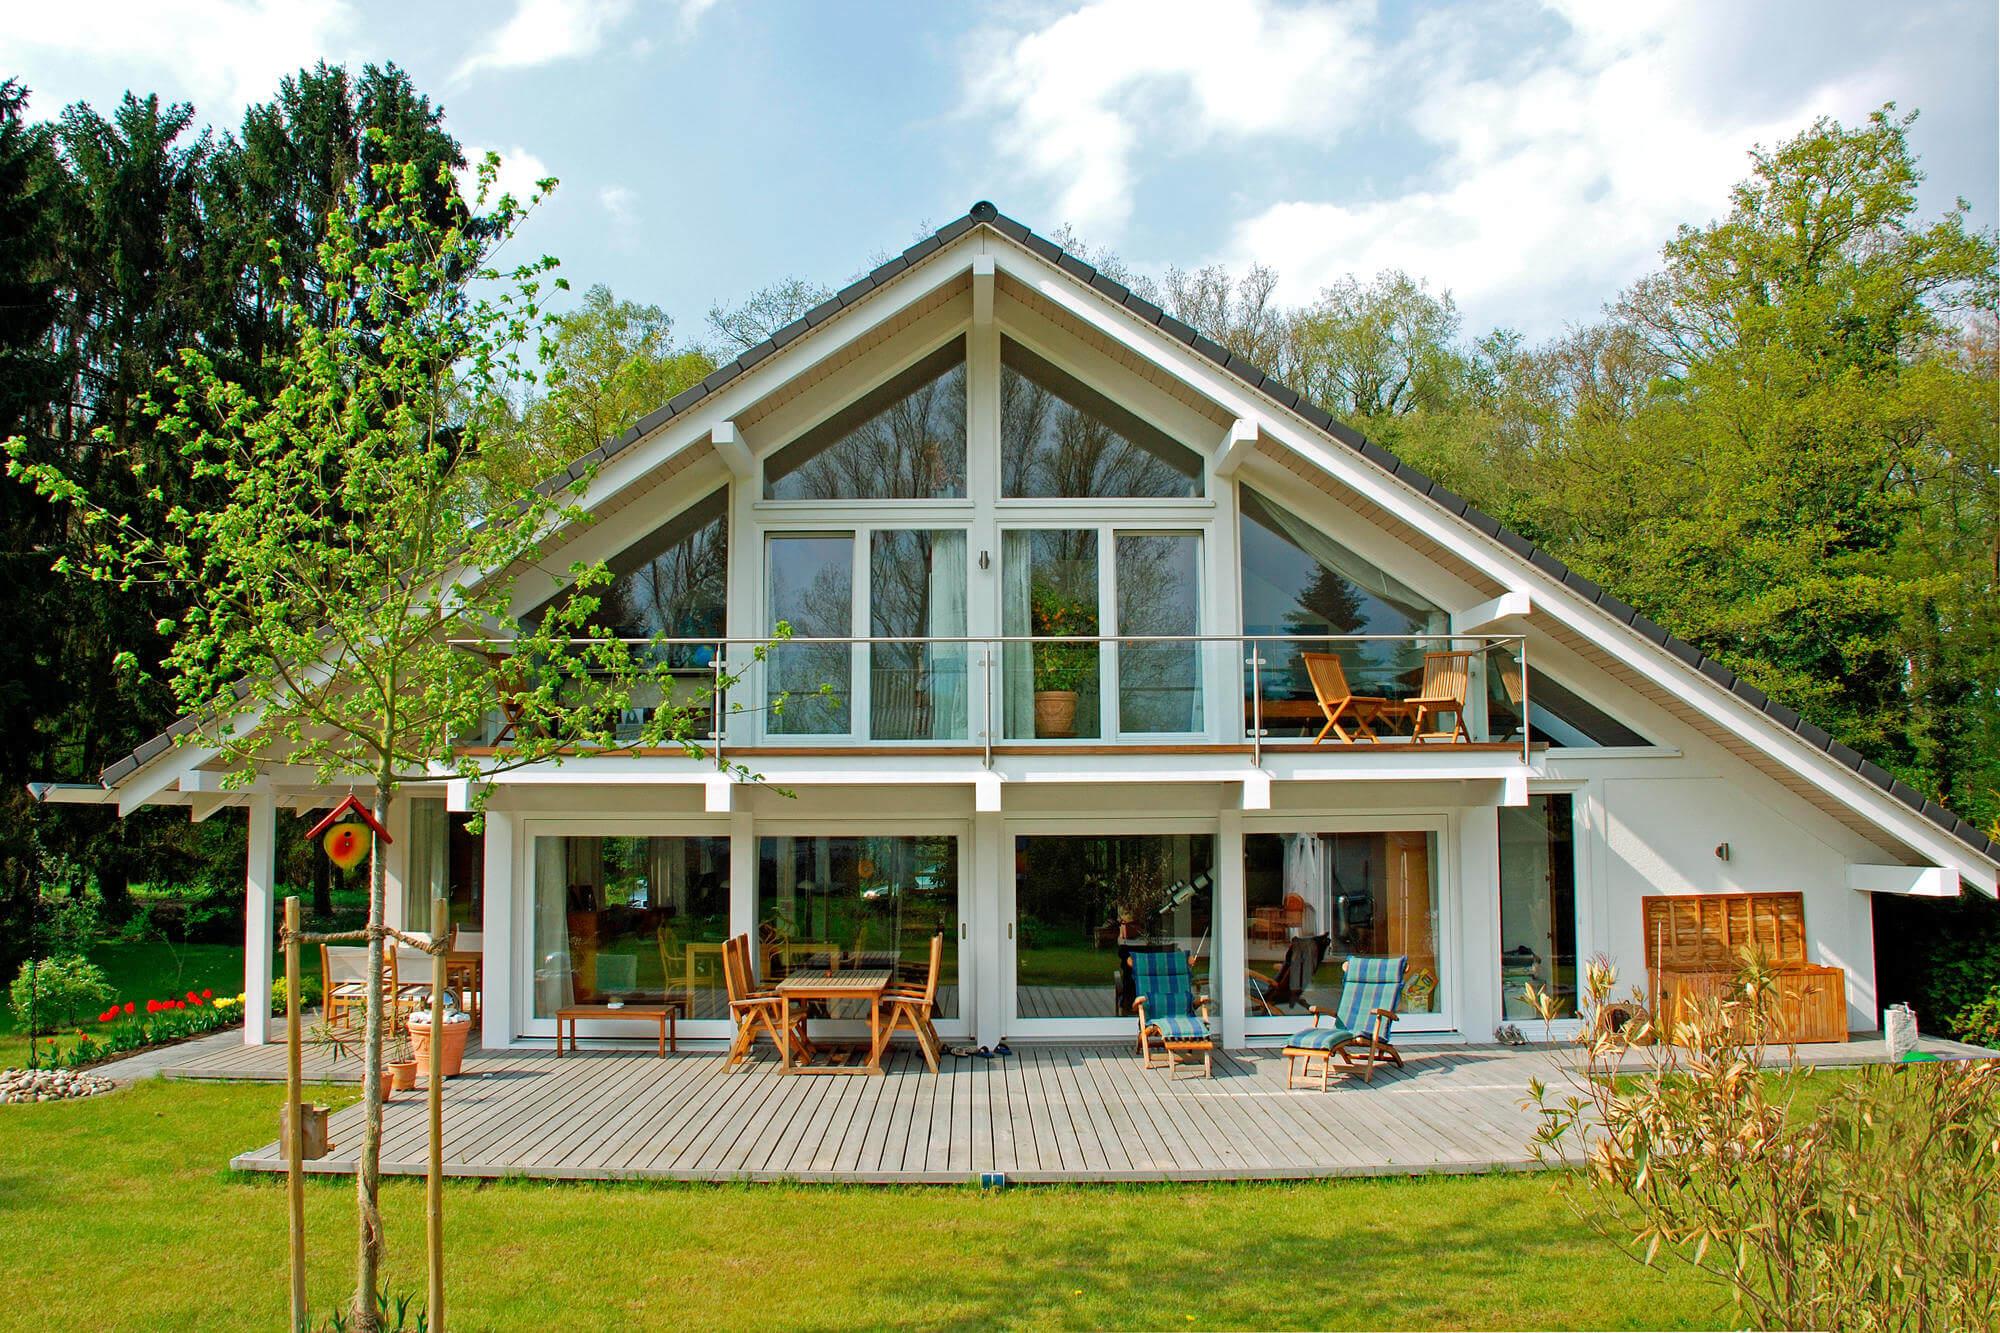 Fachwerk Fertighaus modern Holzskeletthaus - KD Haus